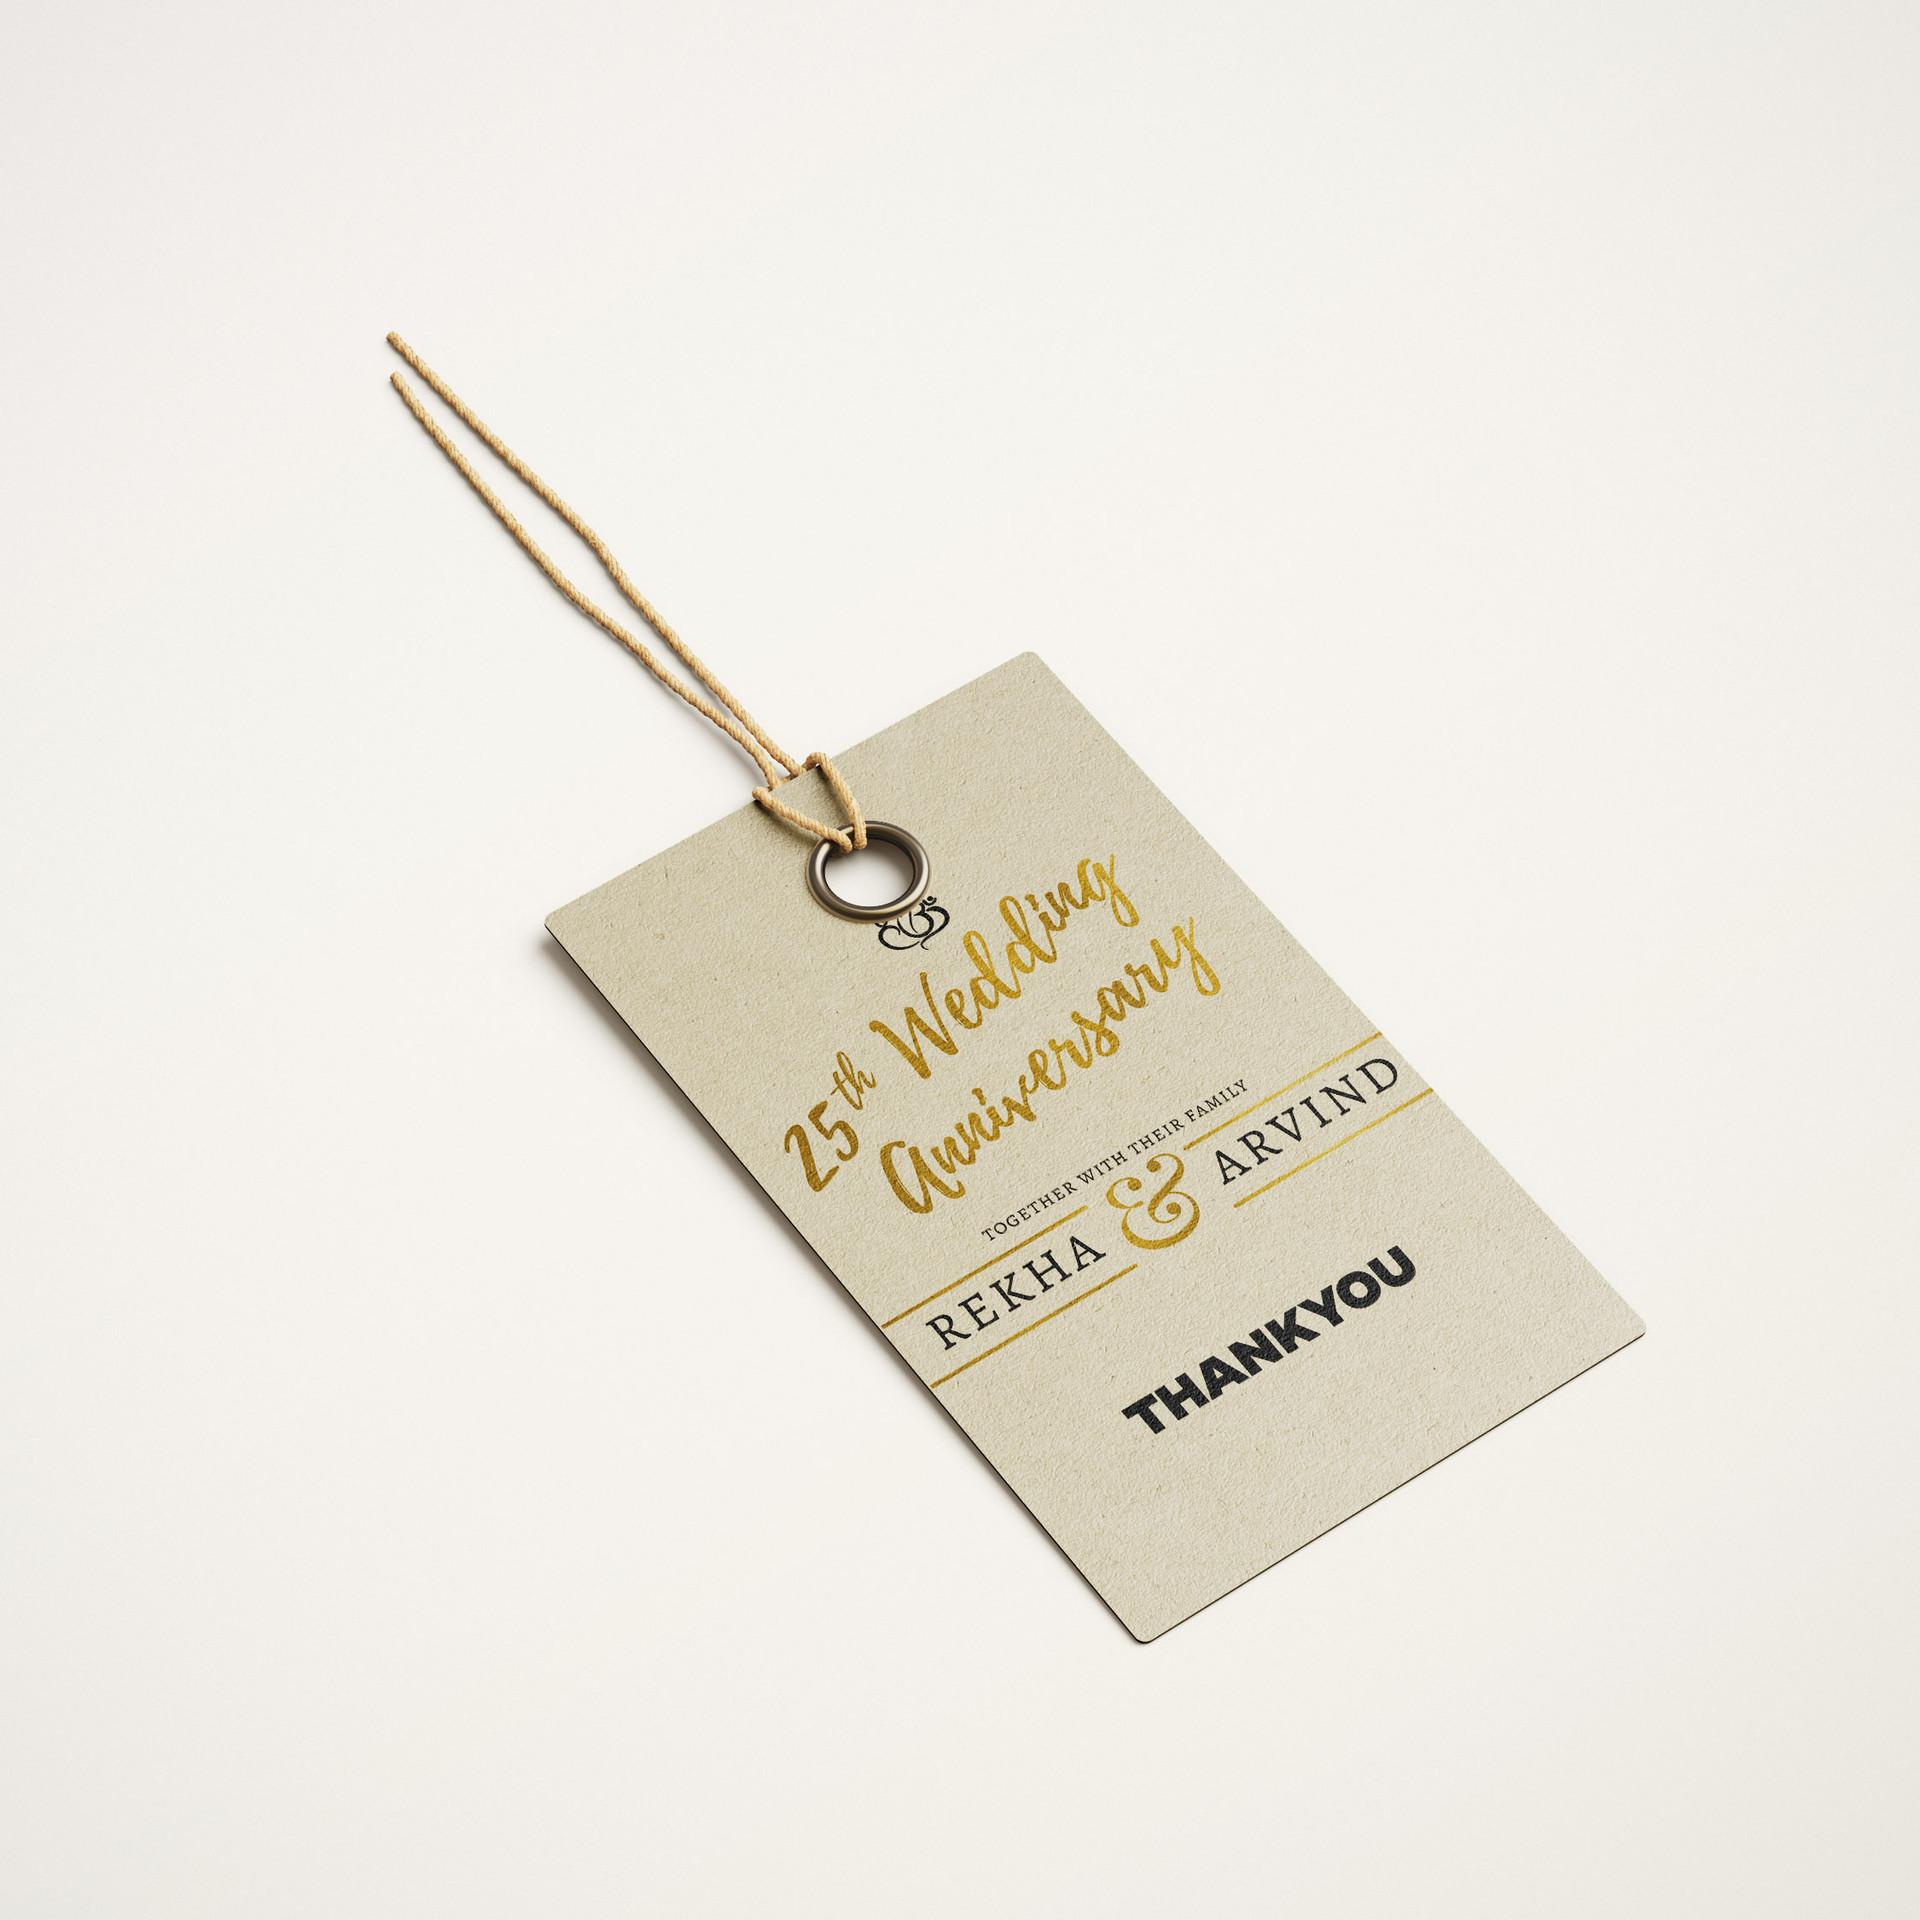 Return Gift tags